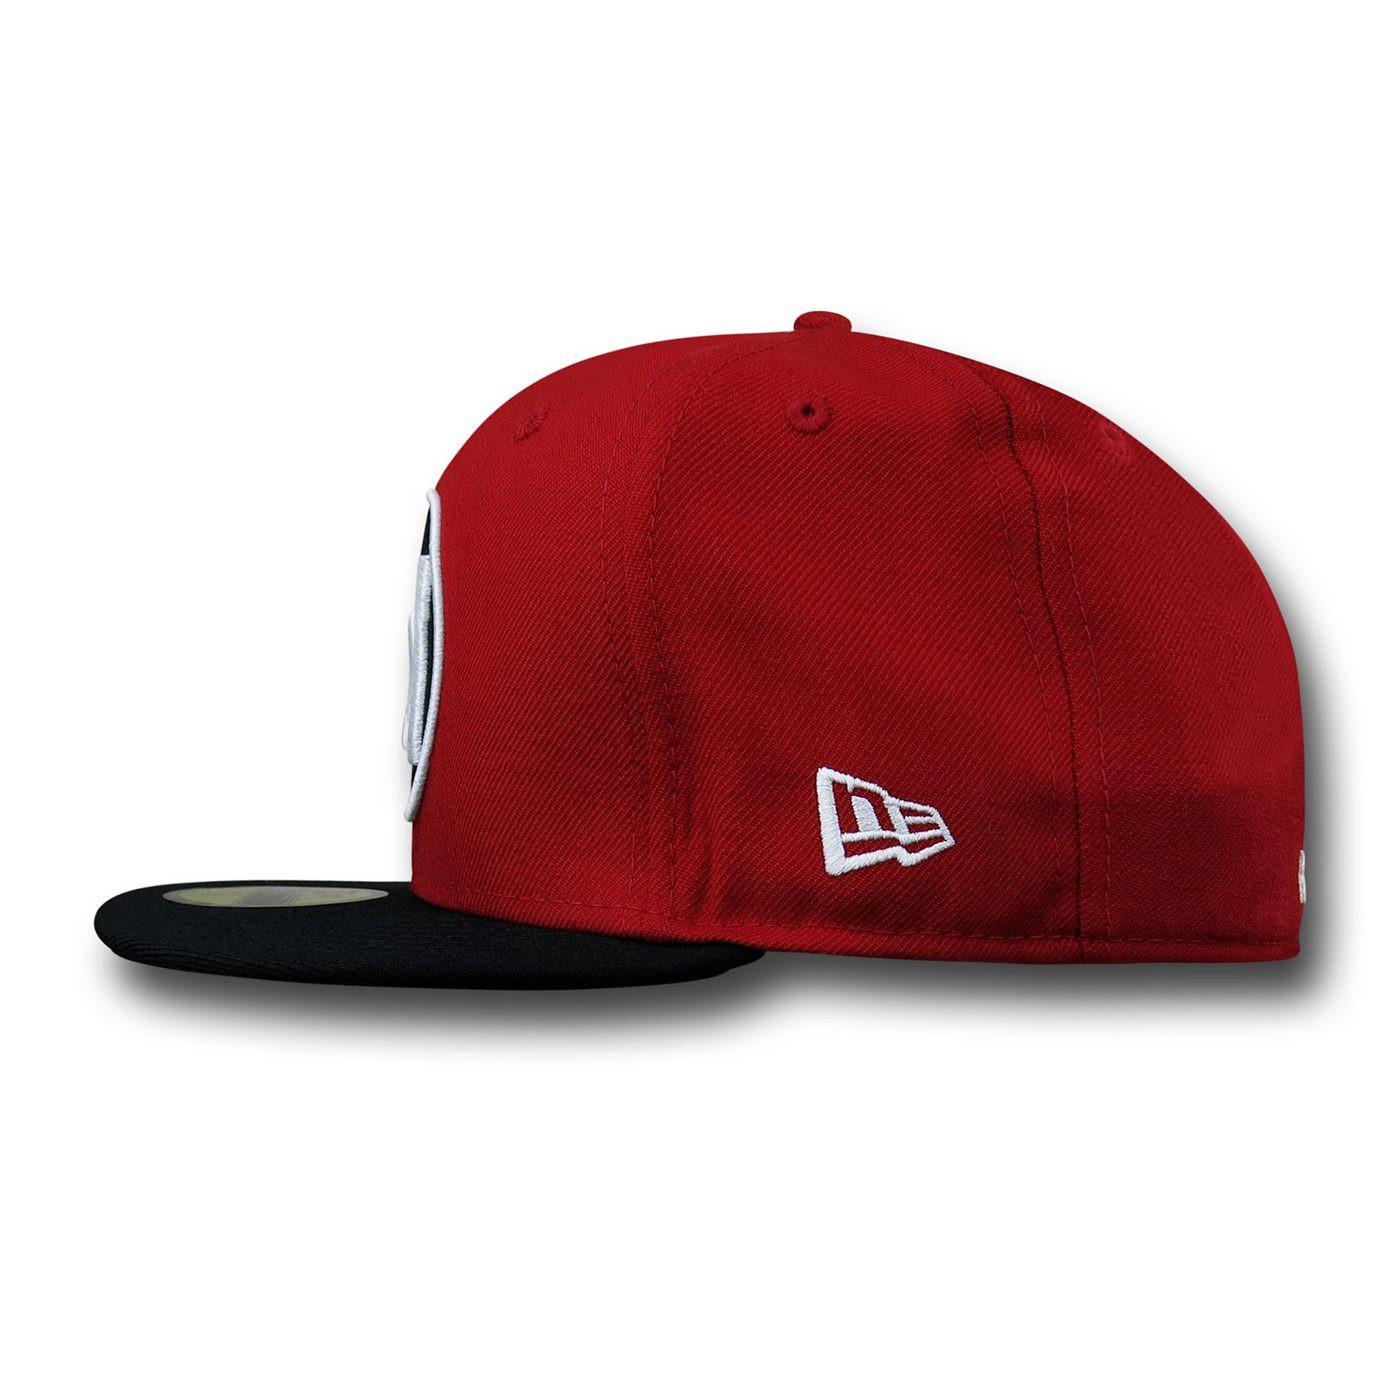 Red Lantern Symbol Red & Black 59Fifty Hat